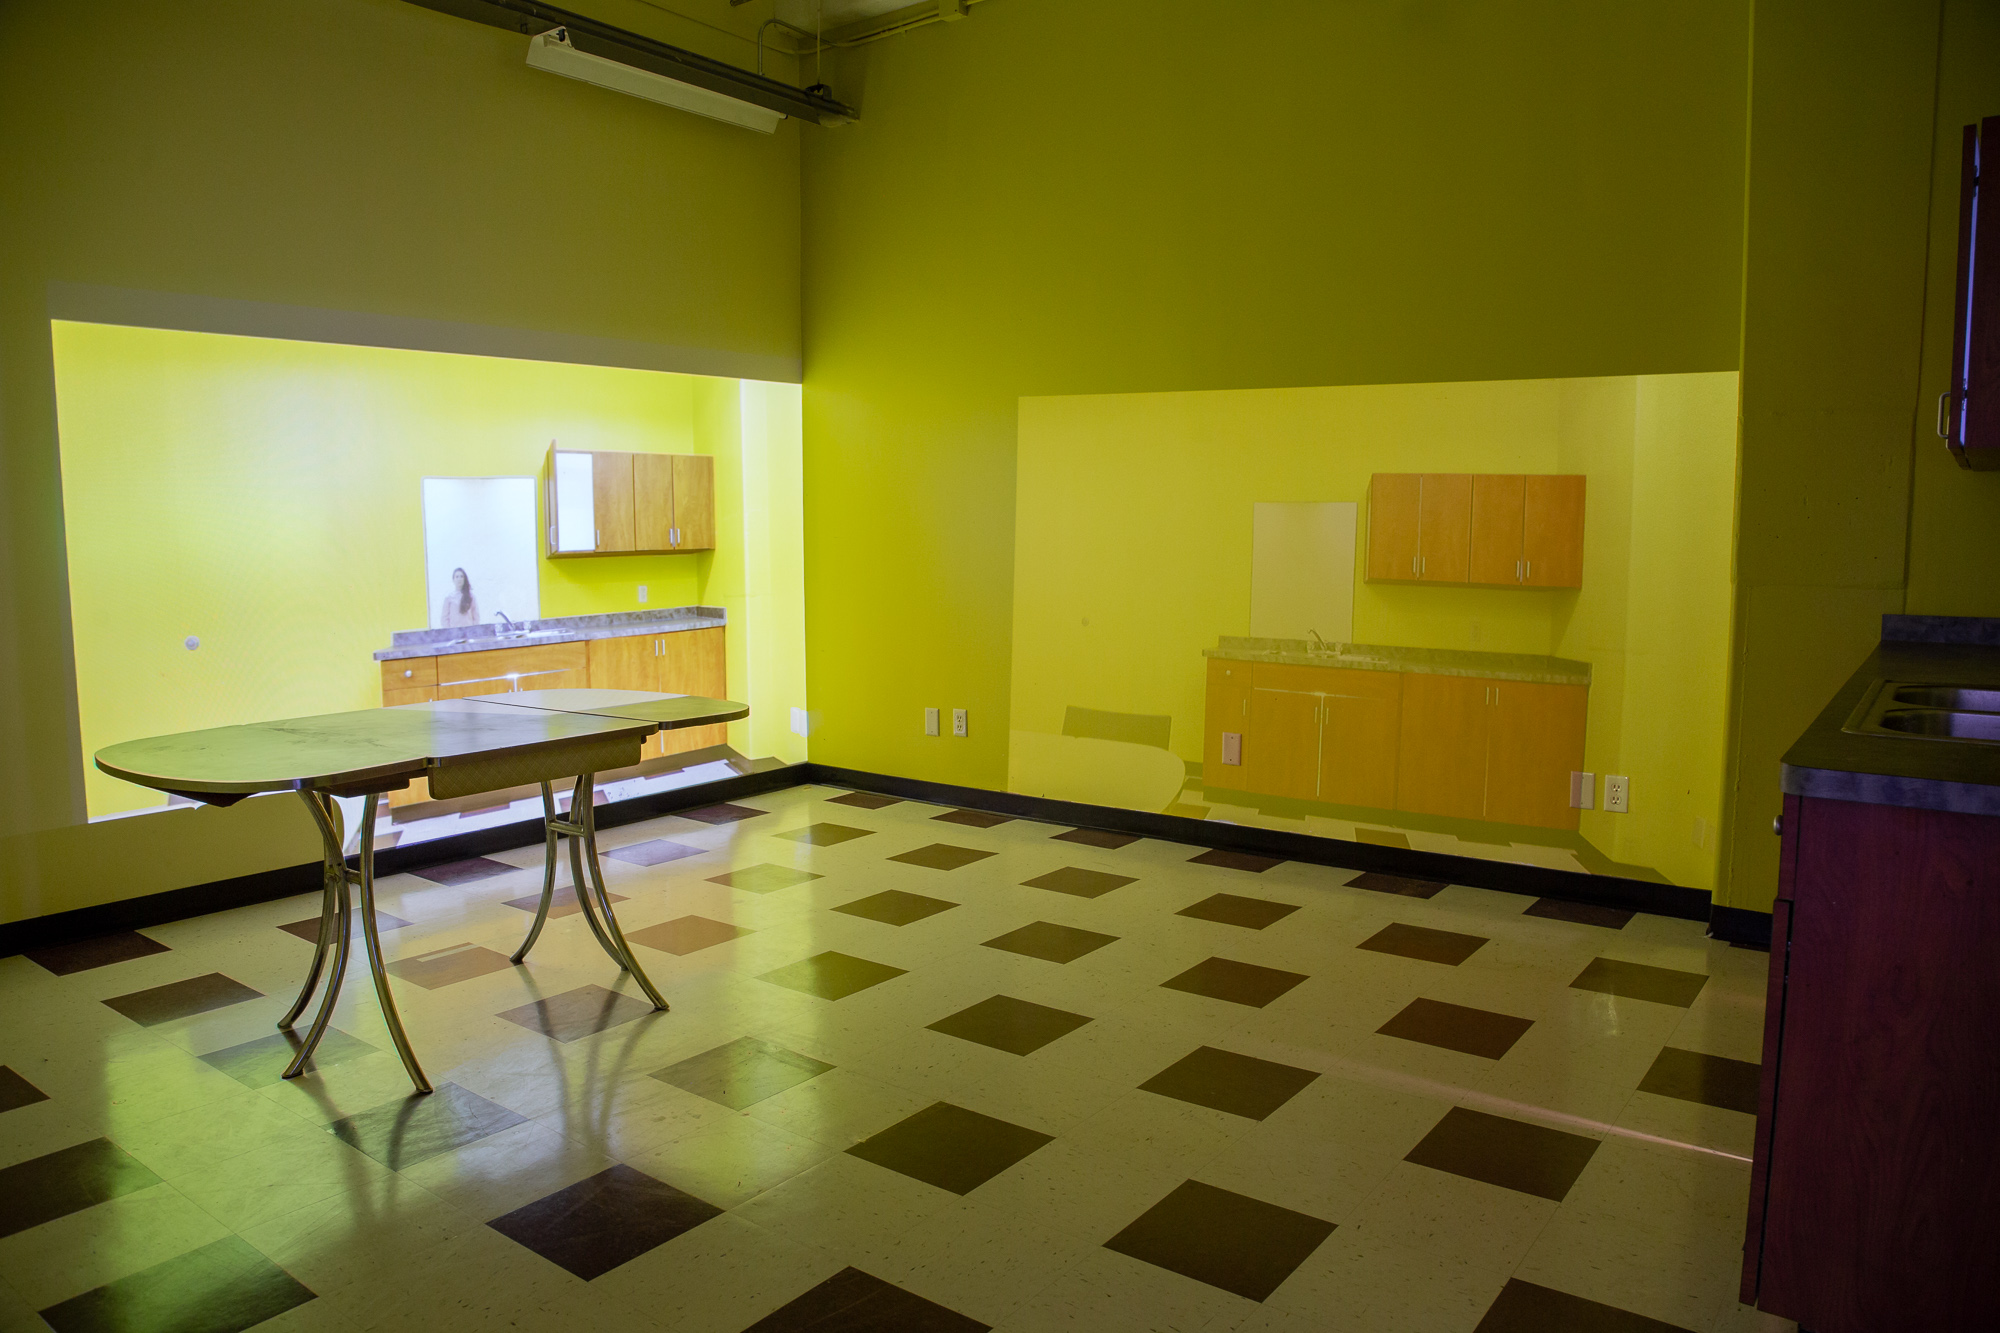 Alexandres_Delirium-Situ_Gilman_Yellow_Installation-IMG_6240.jpg